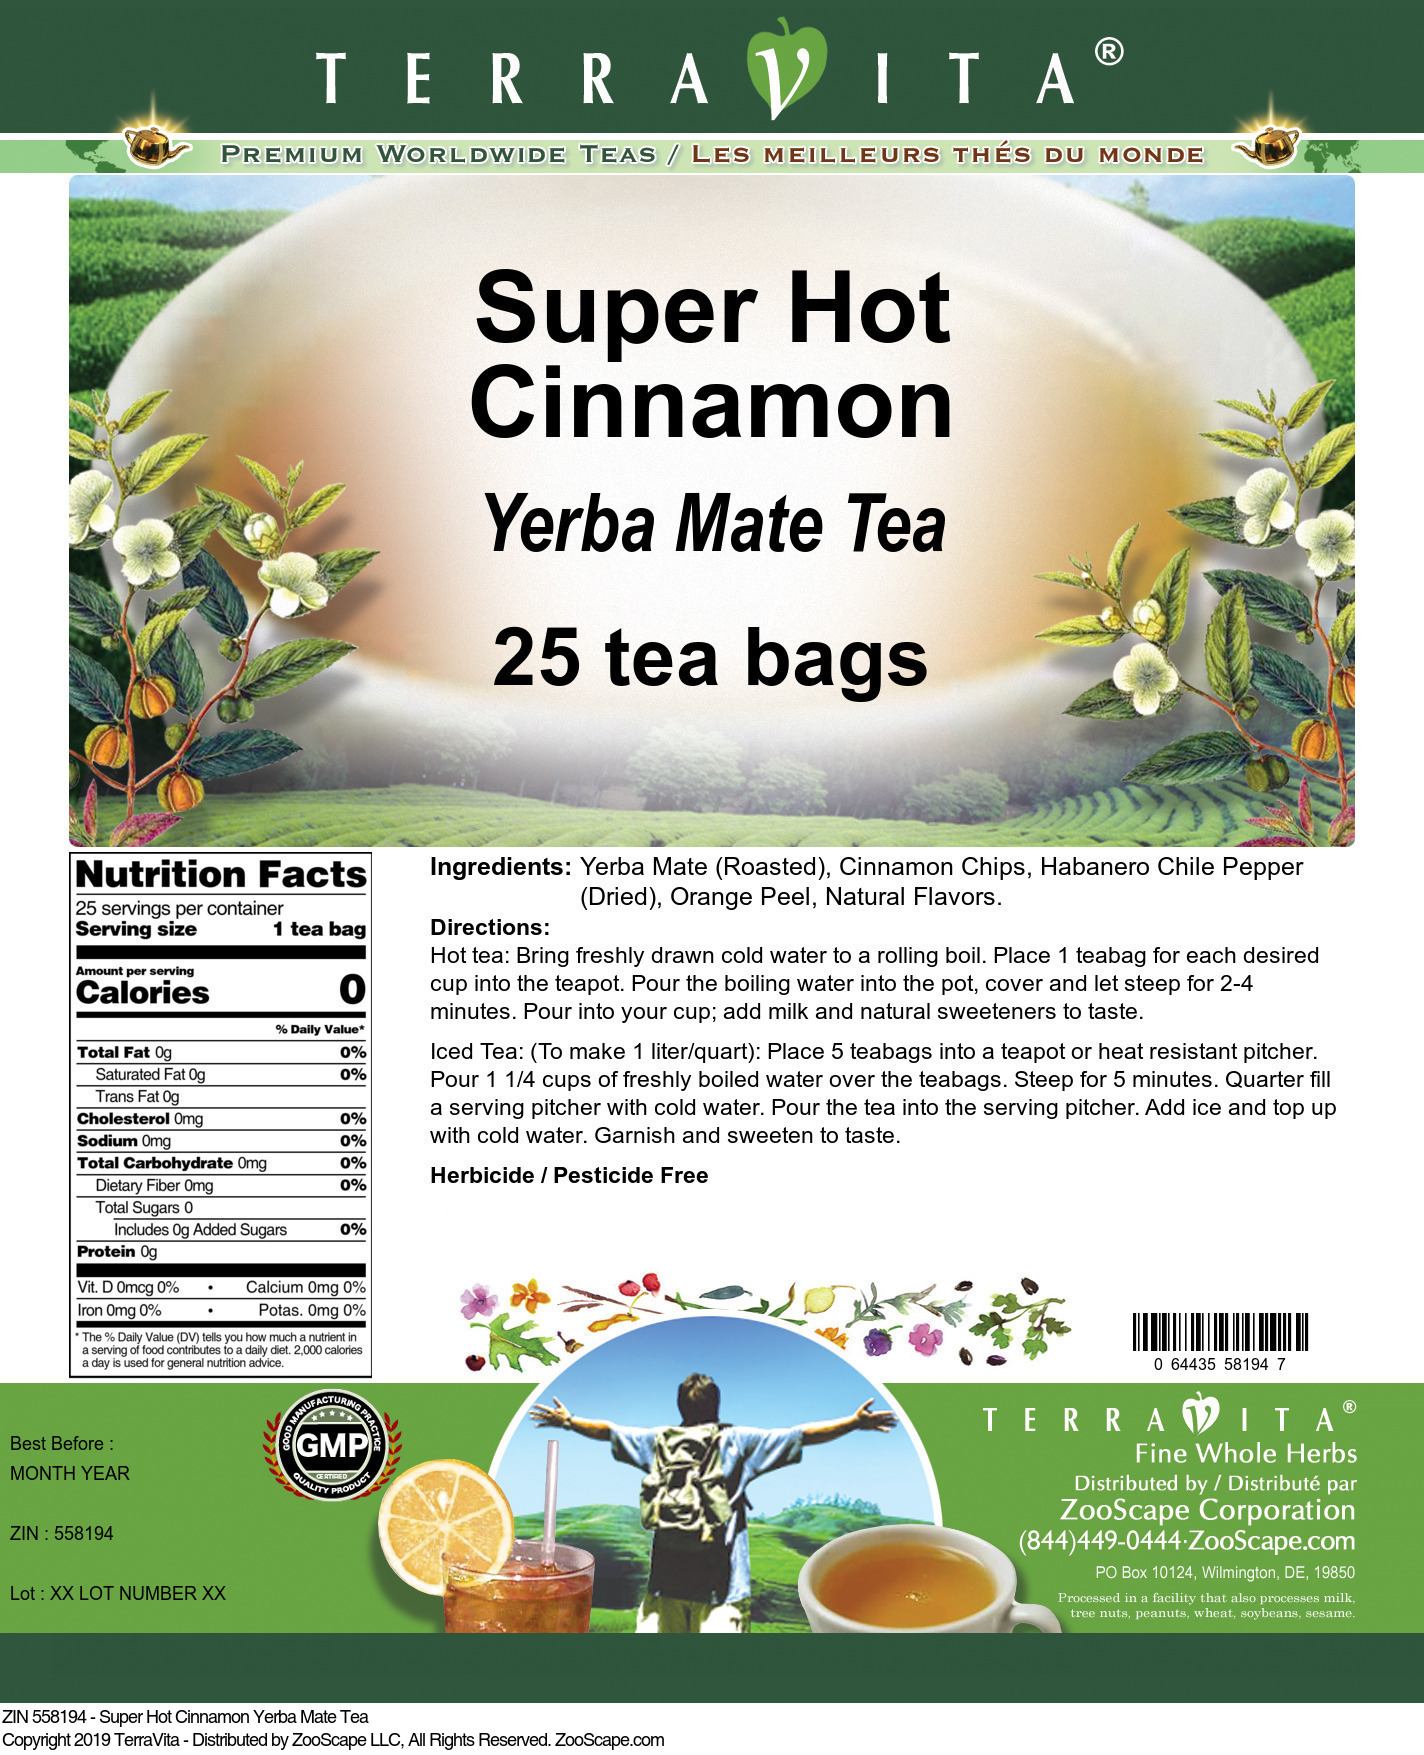 Super Hot Cinnamon Yerba Mate